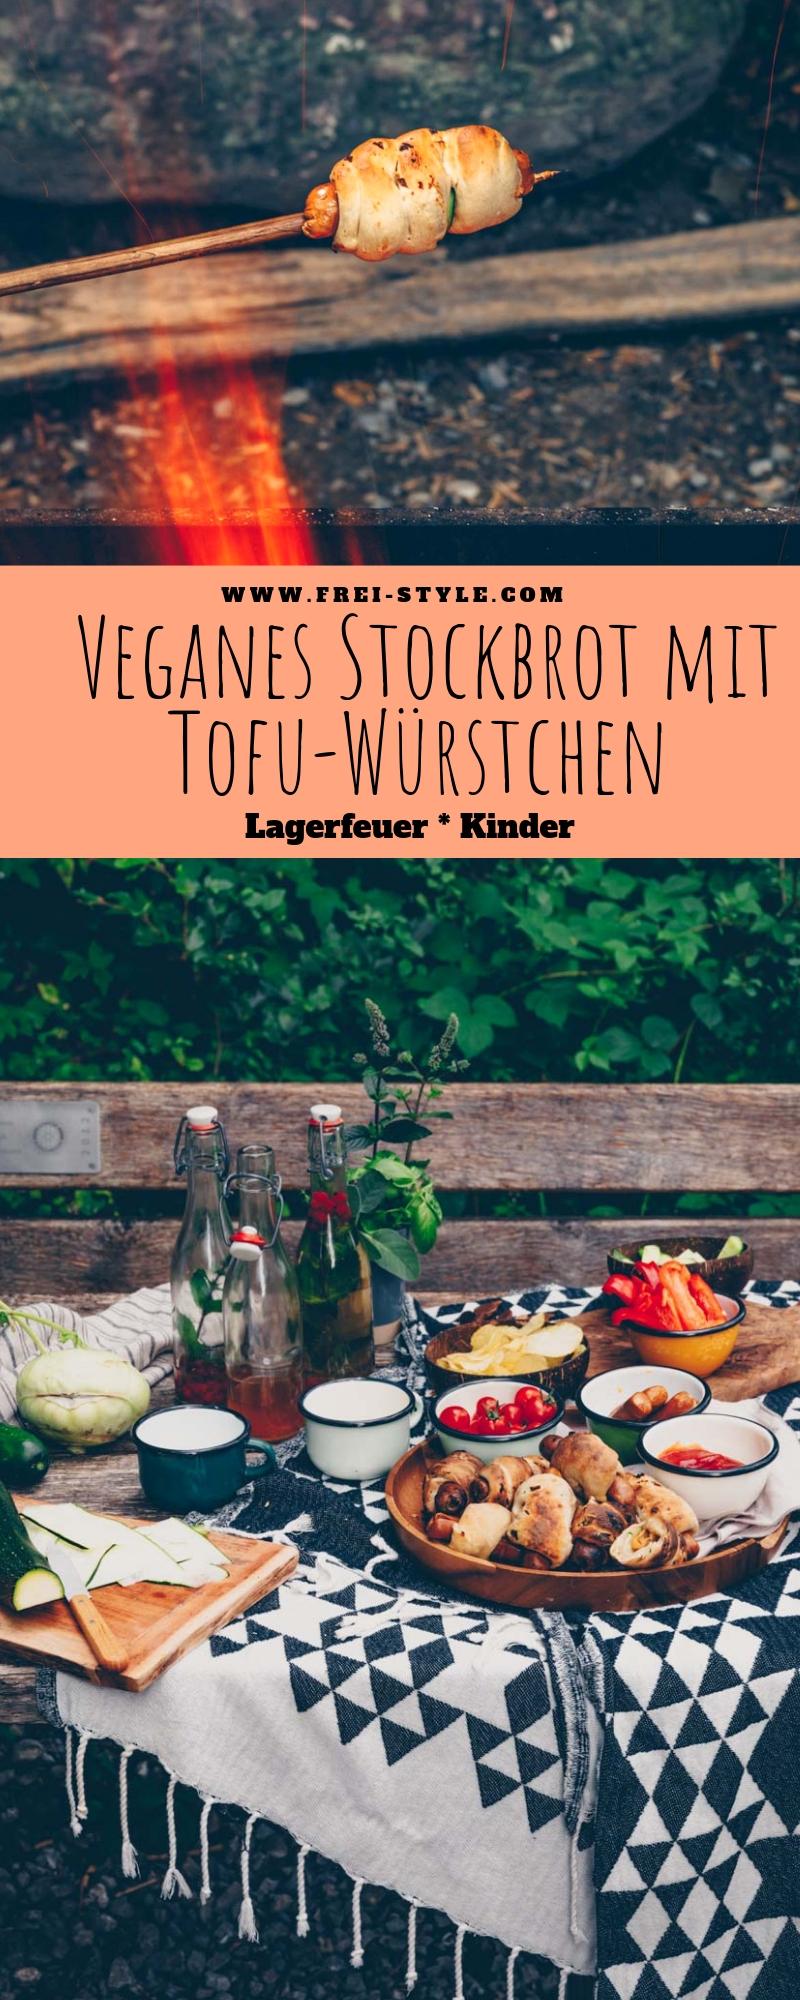 Veganes Stockbrot mit Tofu-Würstchen